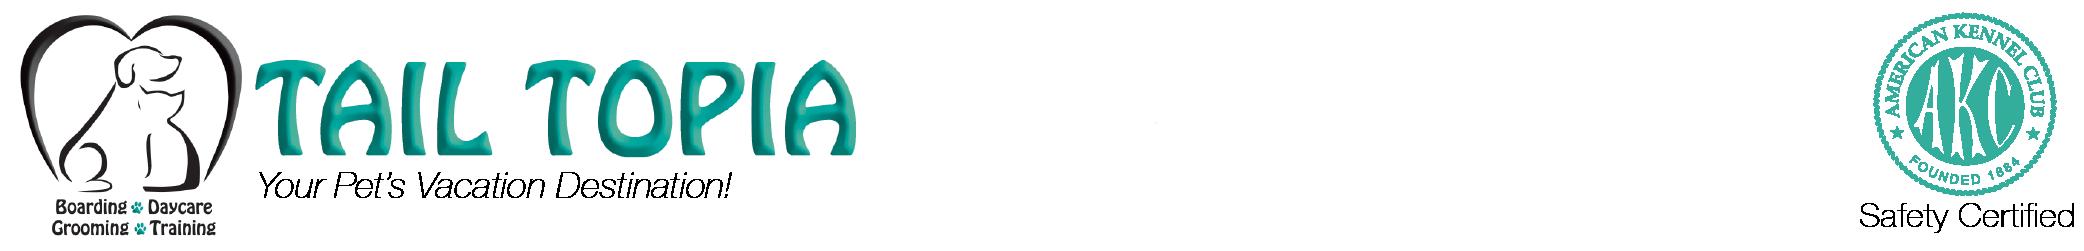 Tail Topia